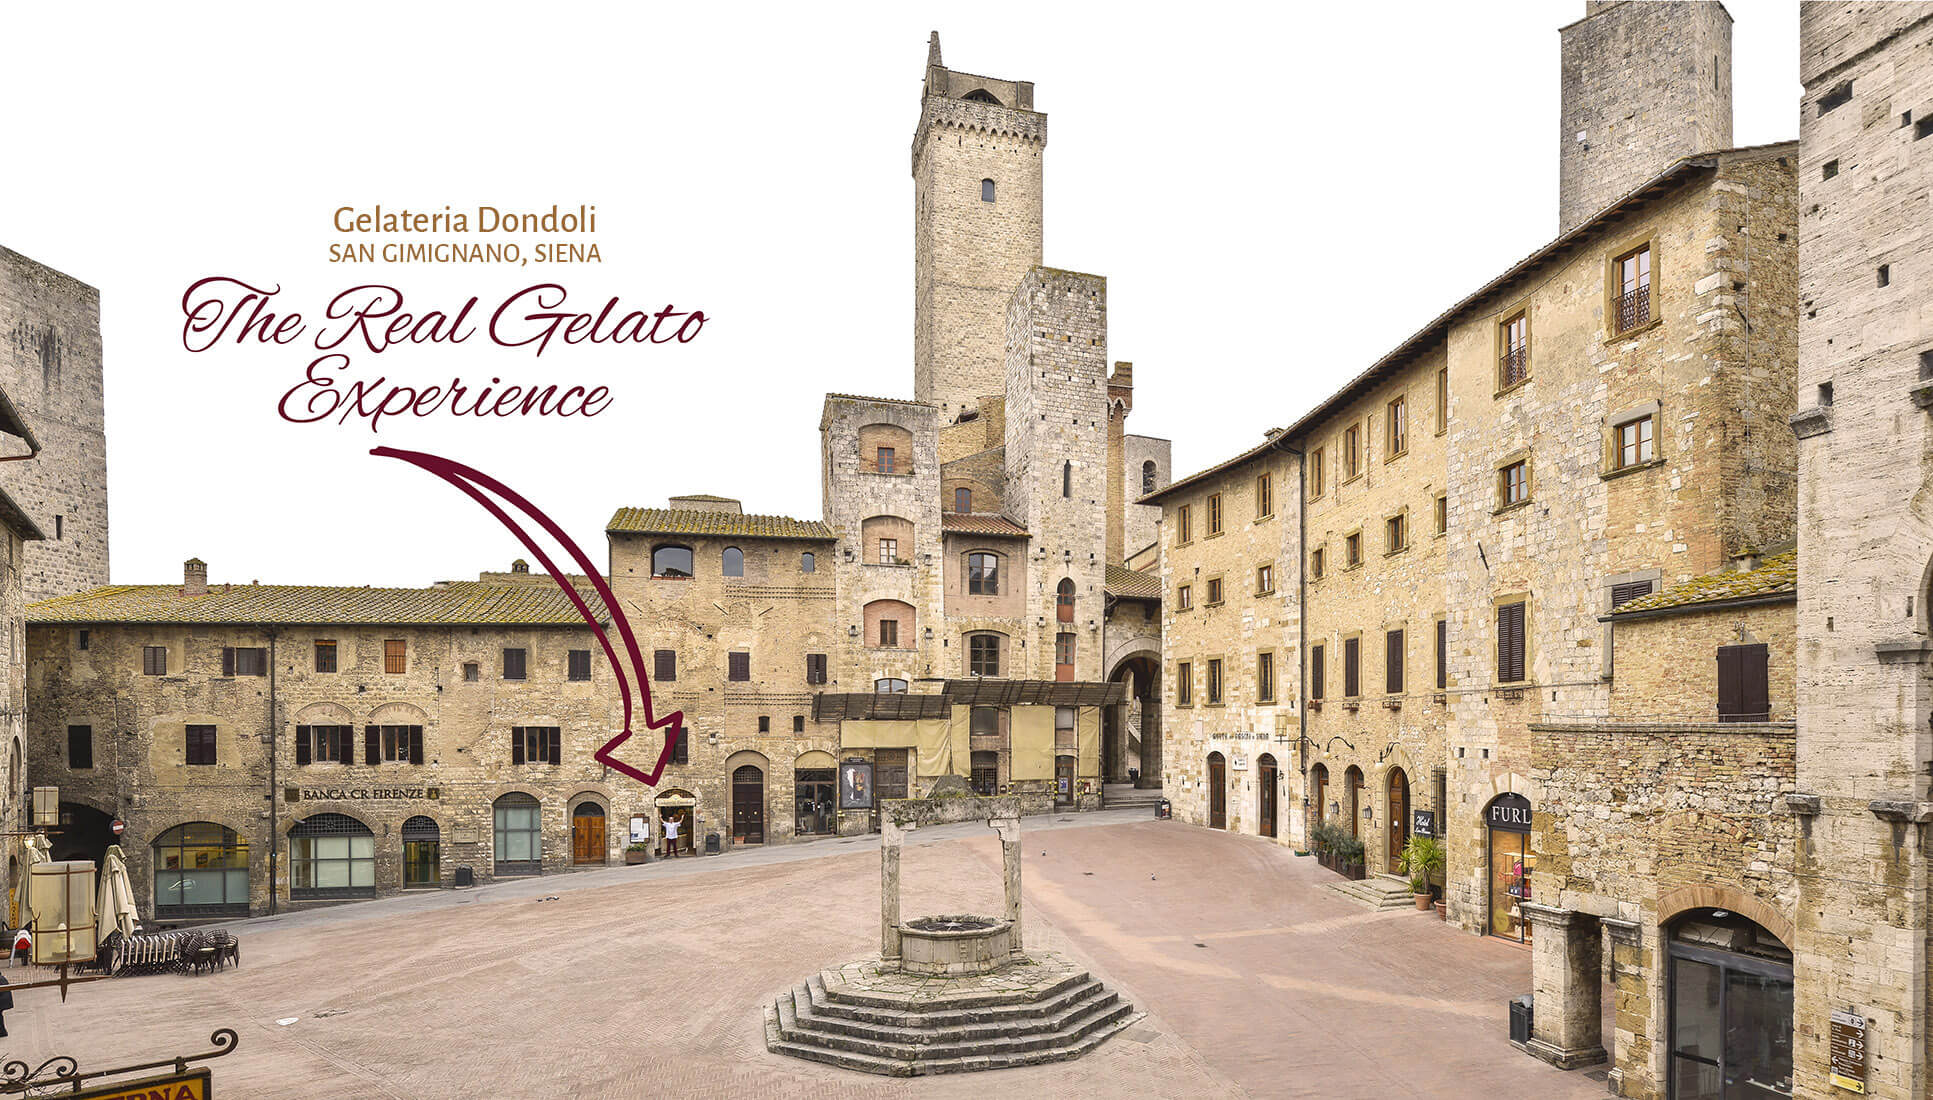 Dondoli Gelato Class San Gimignano Siena